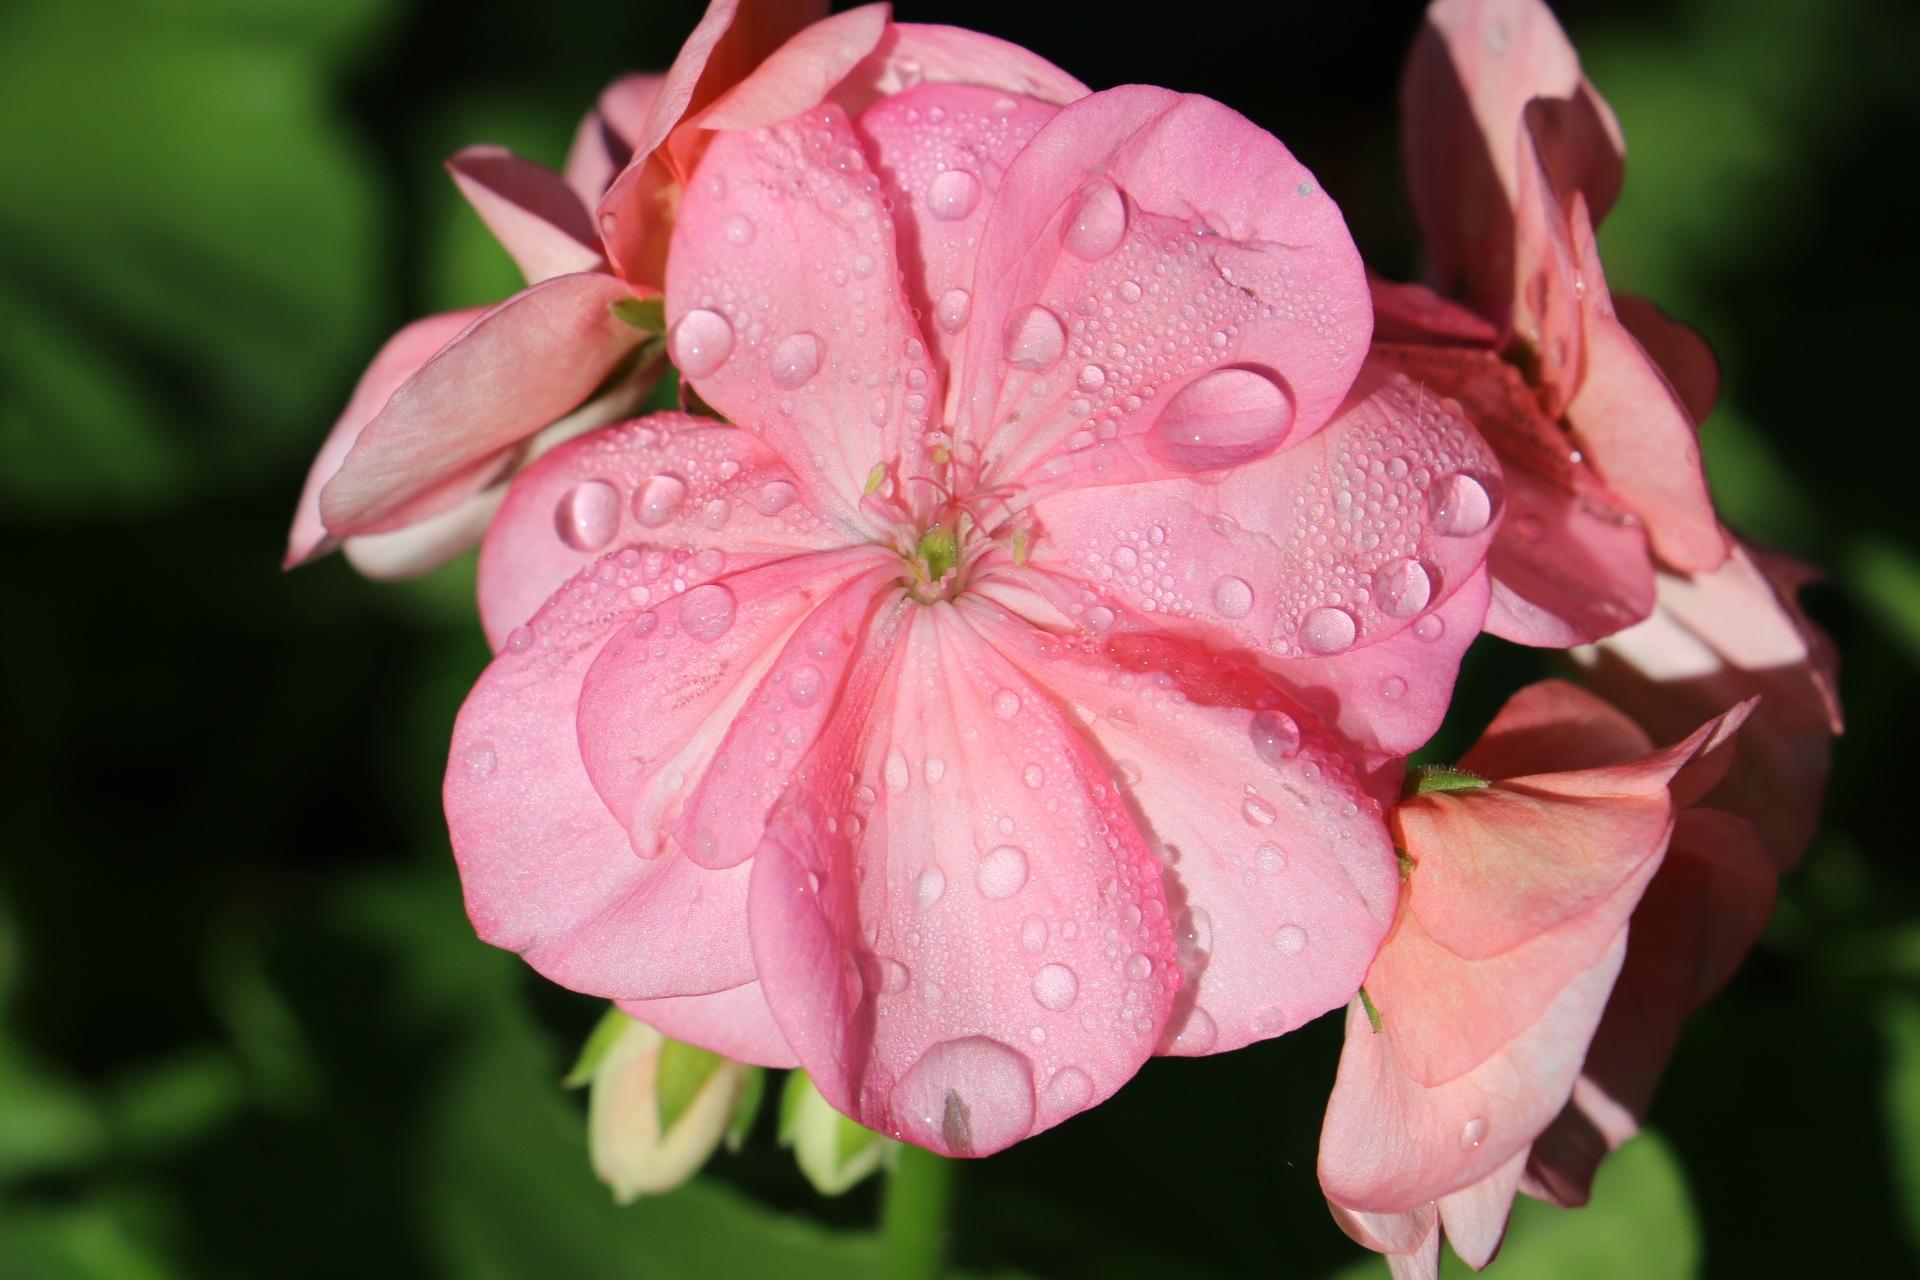 dew drops on geranium by Sanjeev Joshi